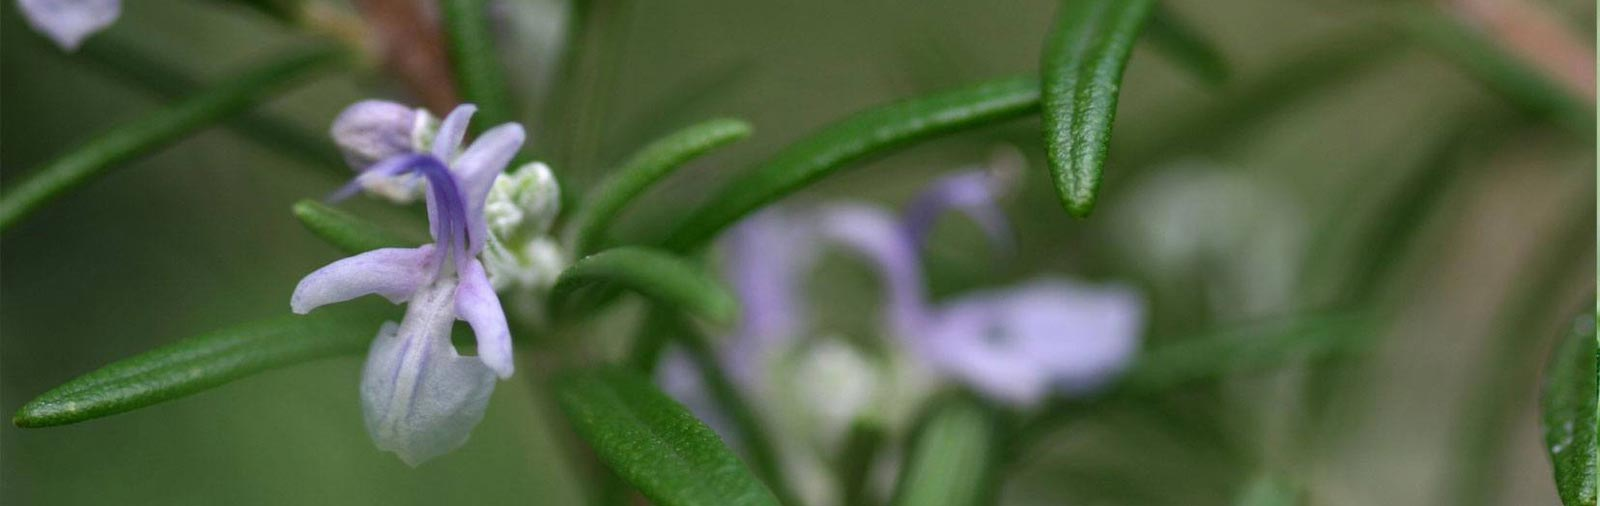 Rosemary - Rosmarinus officinalis L.